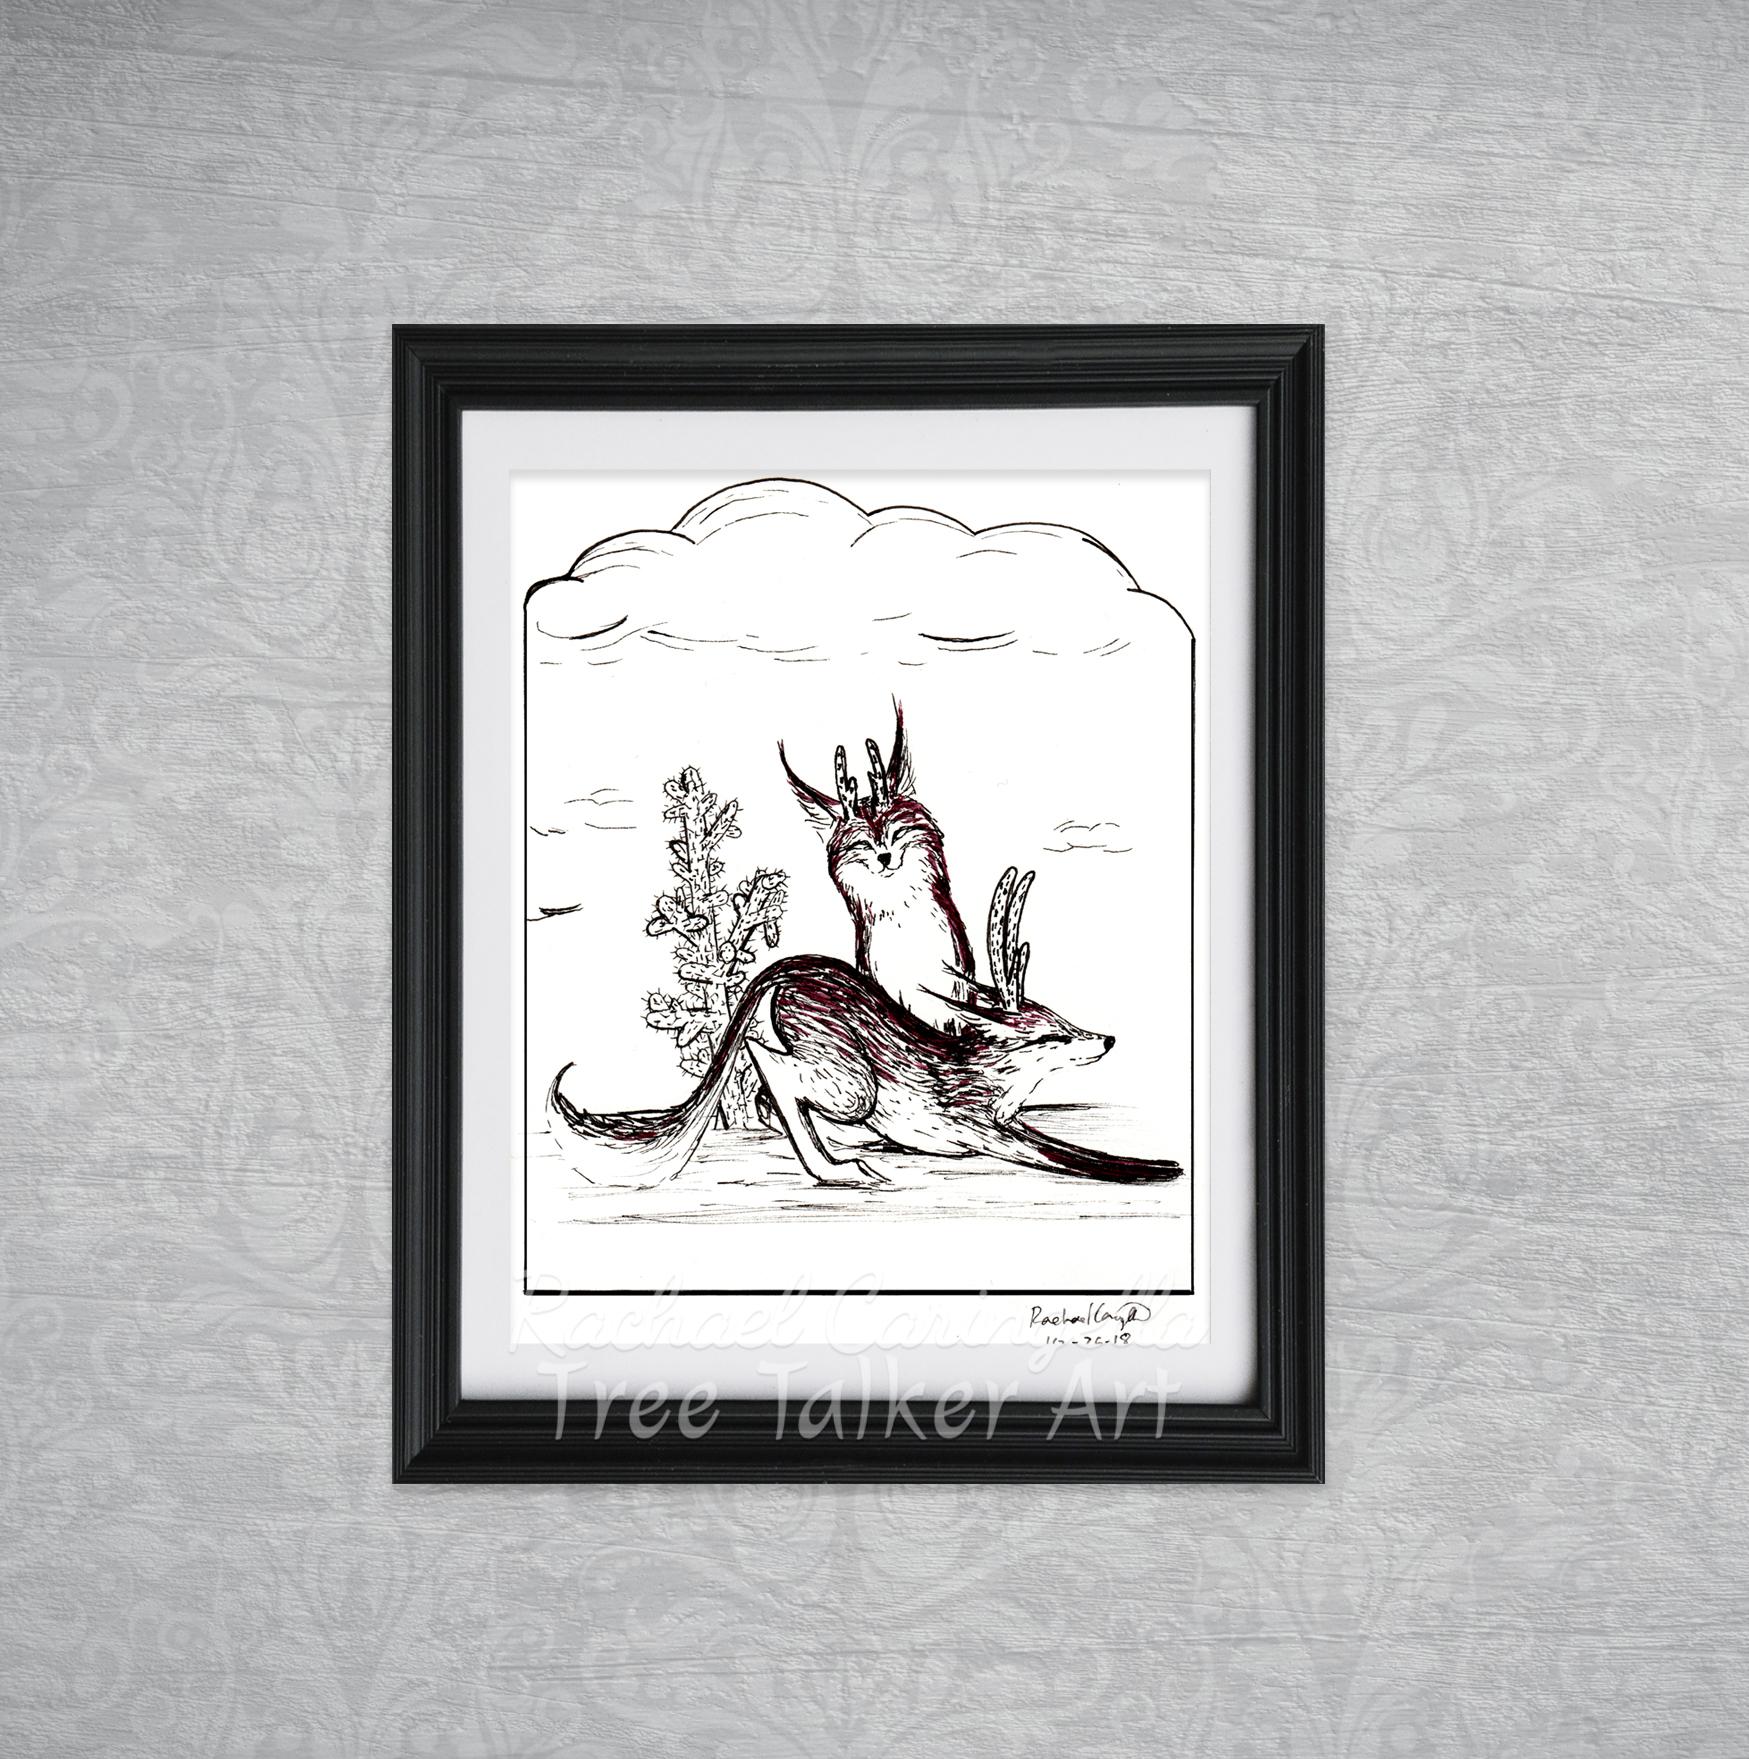 Fox Creature Tree Talker Art Inktober 2018 Illustration of A Fox Creature